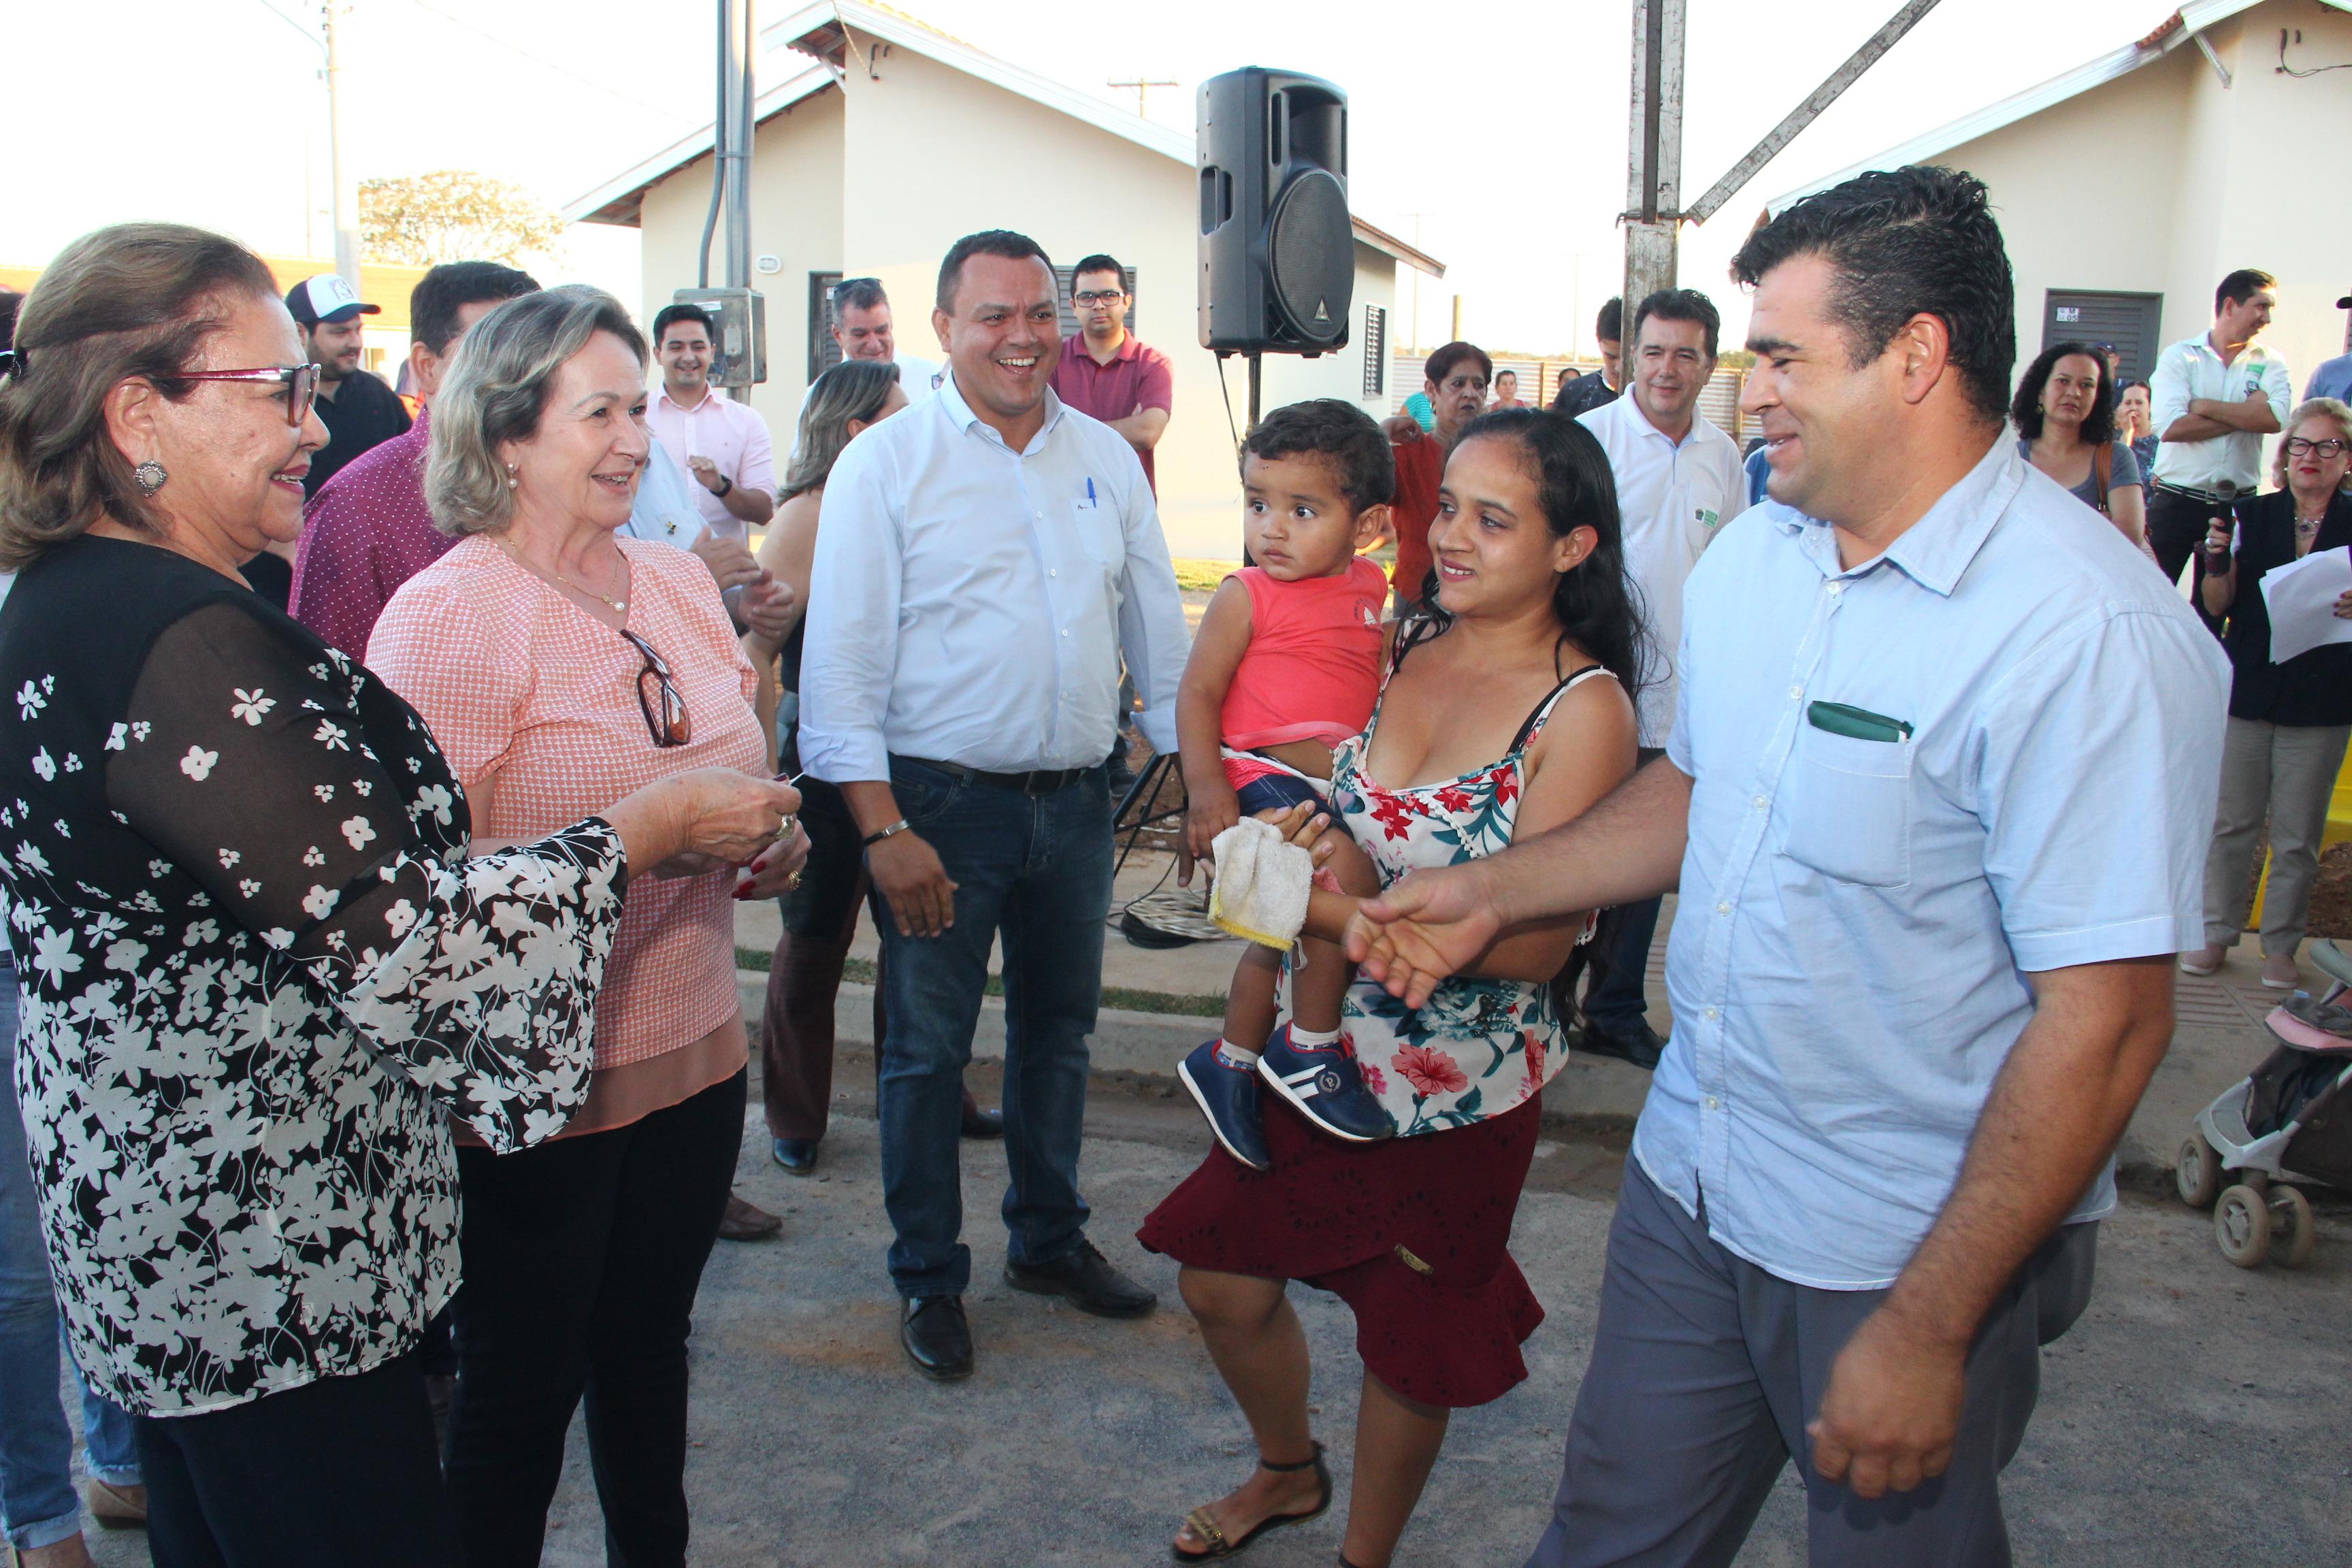 Entrega das chaves das 87 casas do Residencial Lago Azul / Etapa I, localizado no Bairro Rincão Bonito